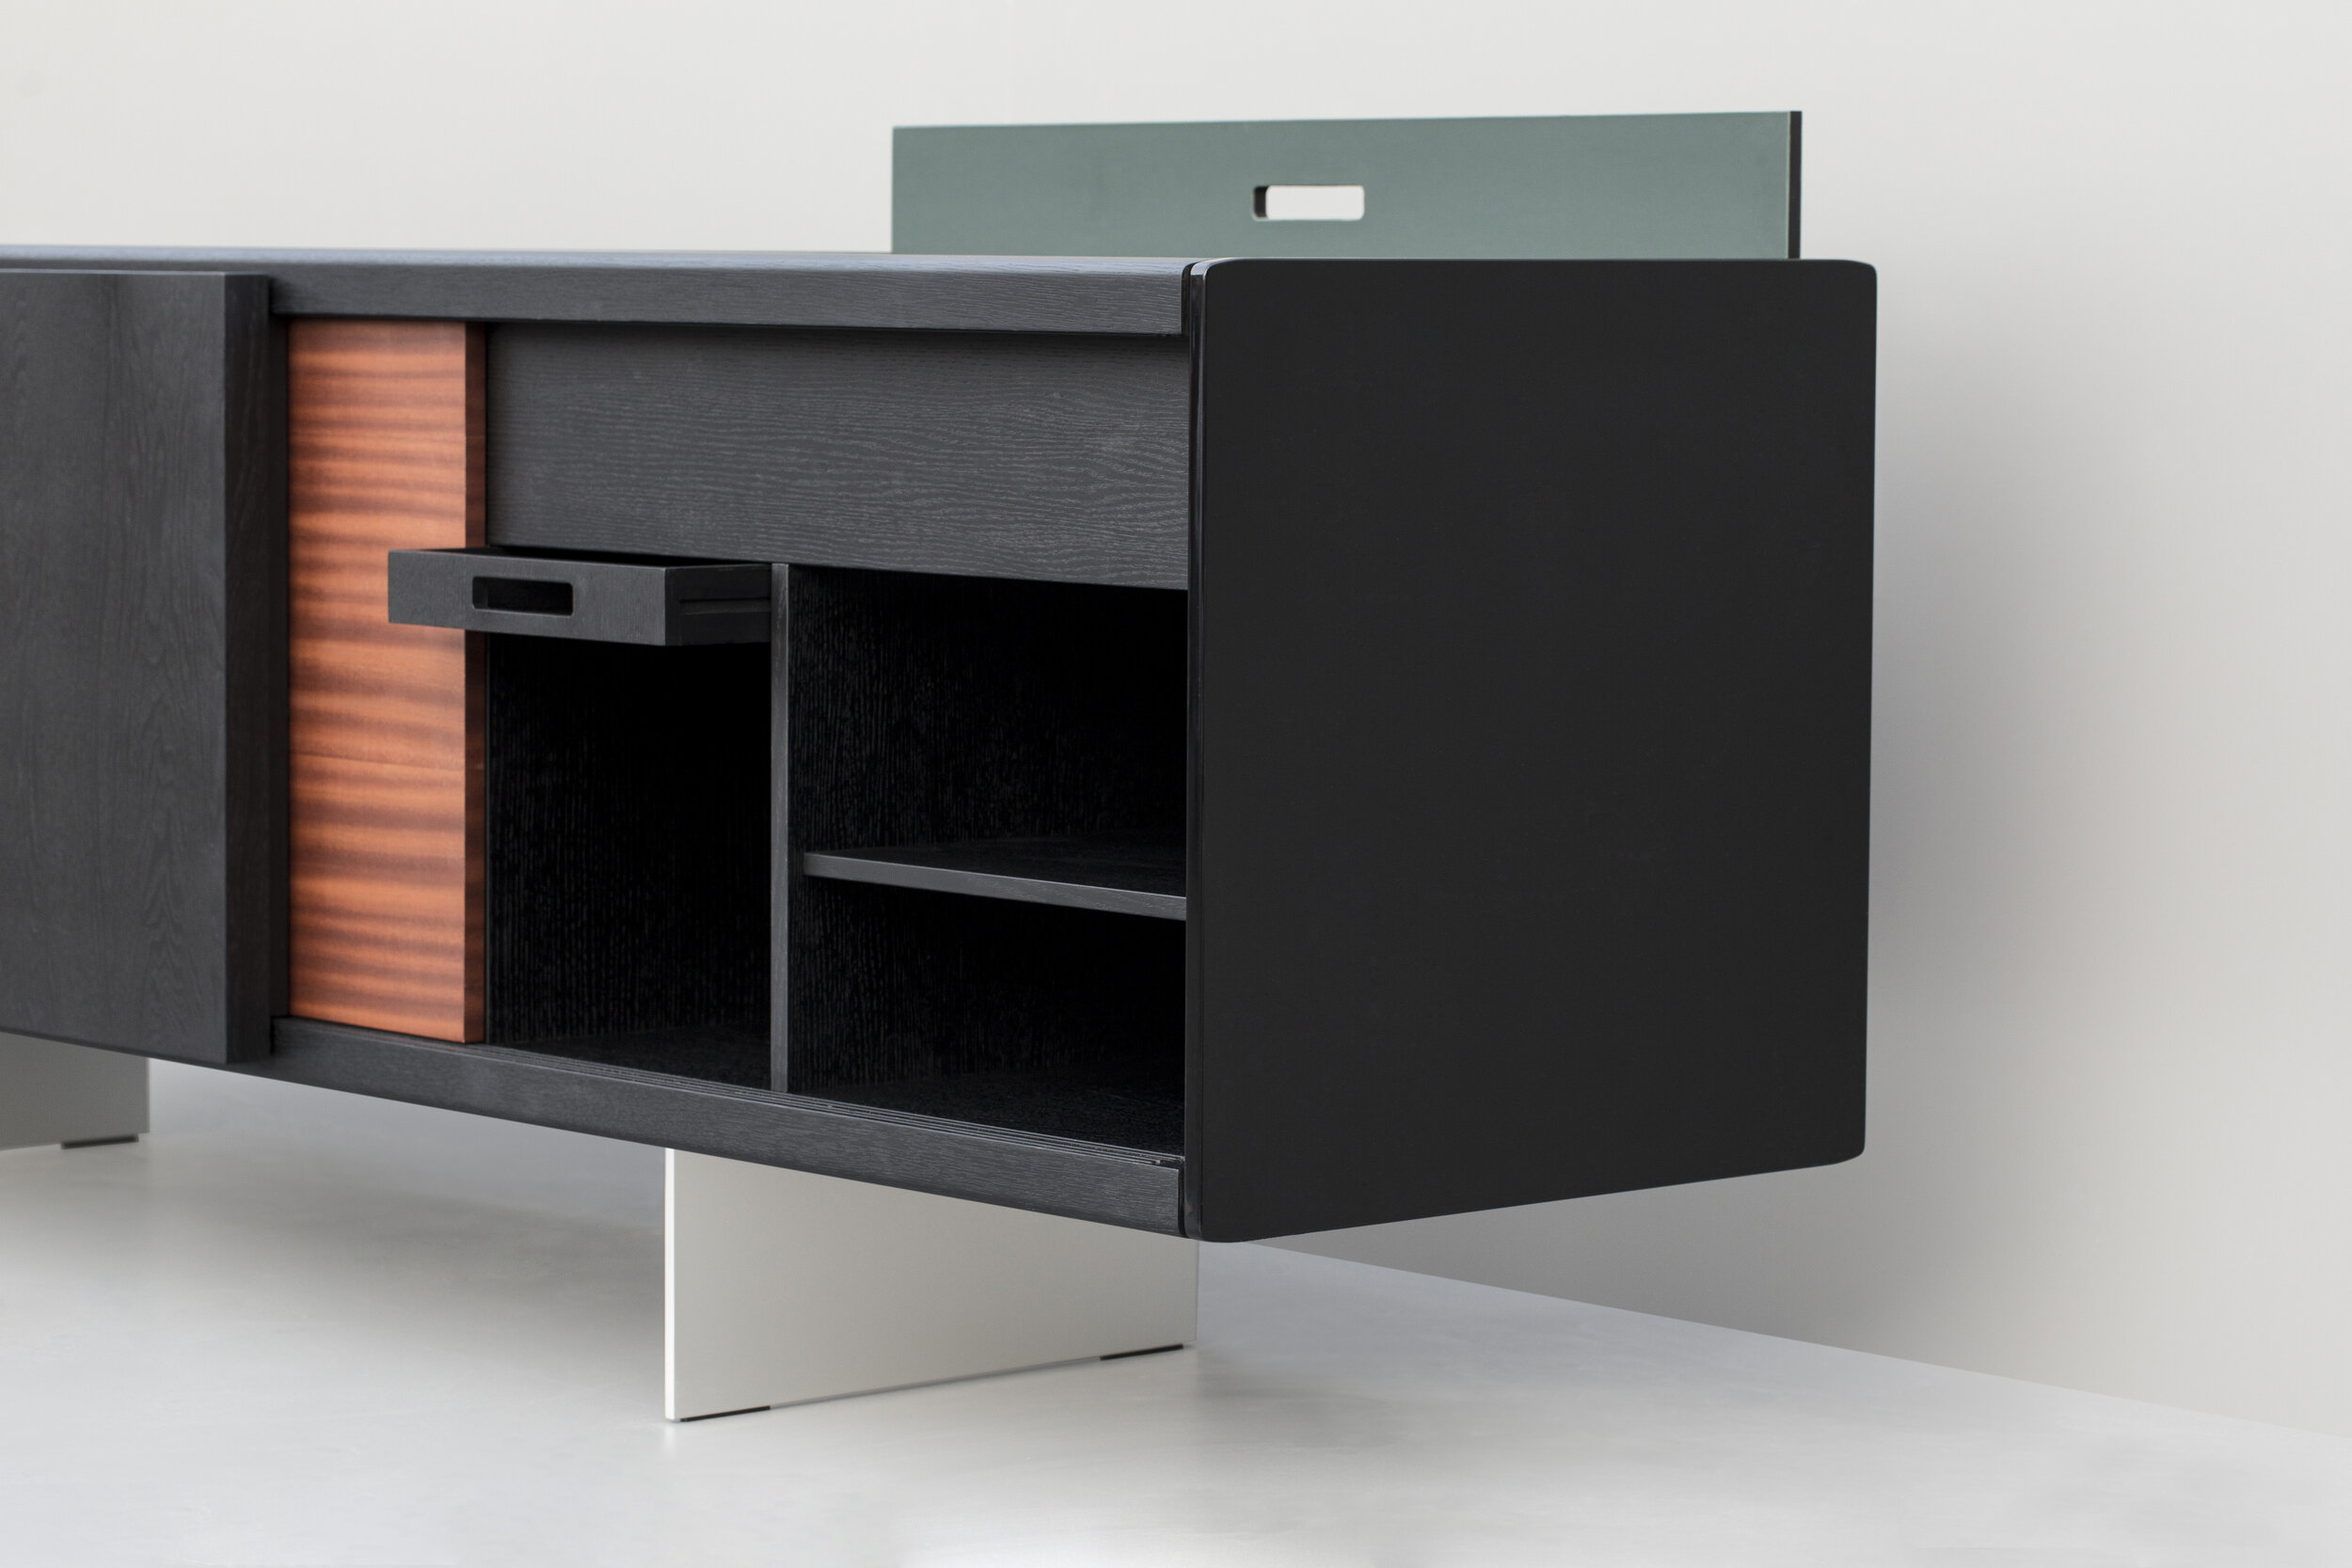 frank-london-collection-10-november-2017-sideboard-0202-r_1 adj.jpg